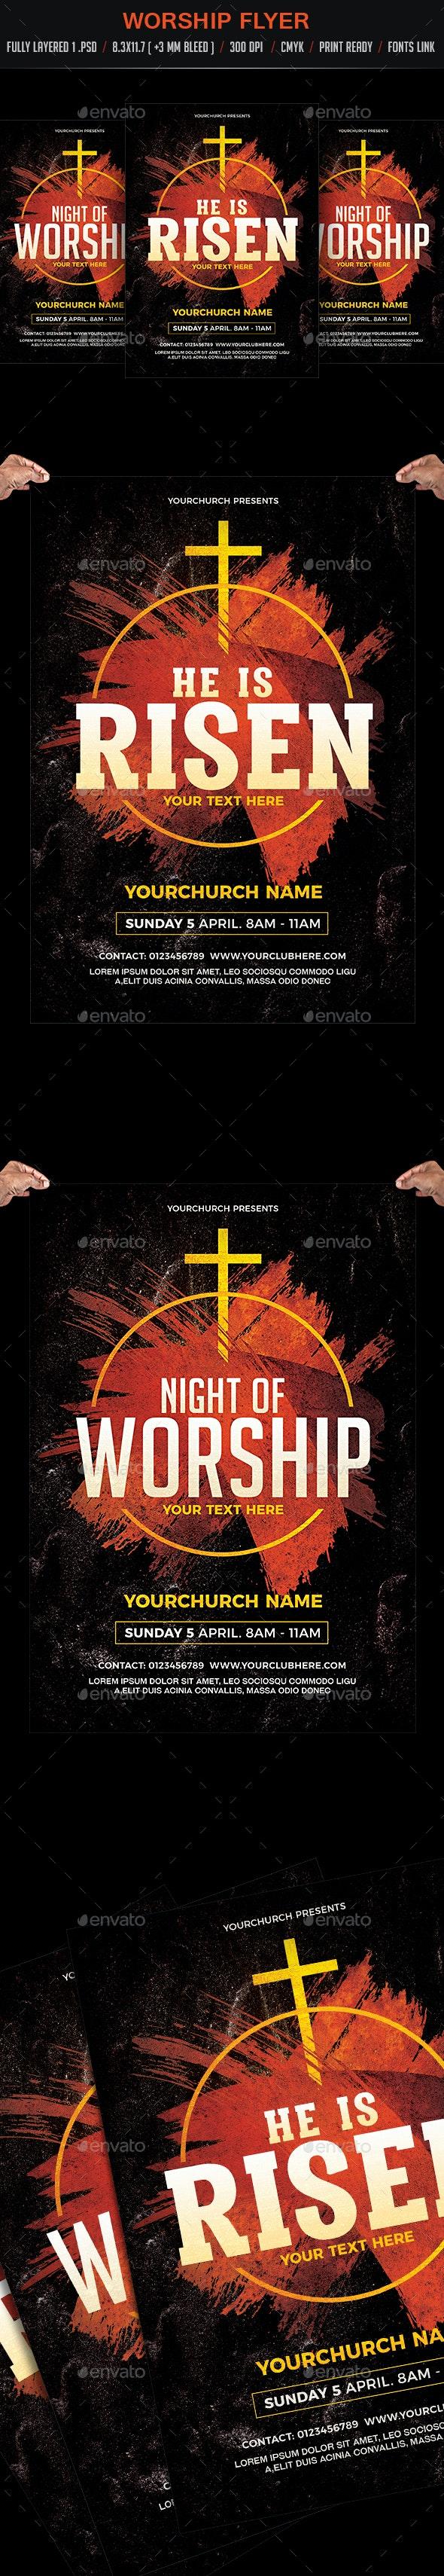 Worship Flyer Poster - Church Flyers